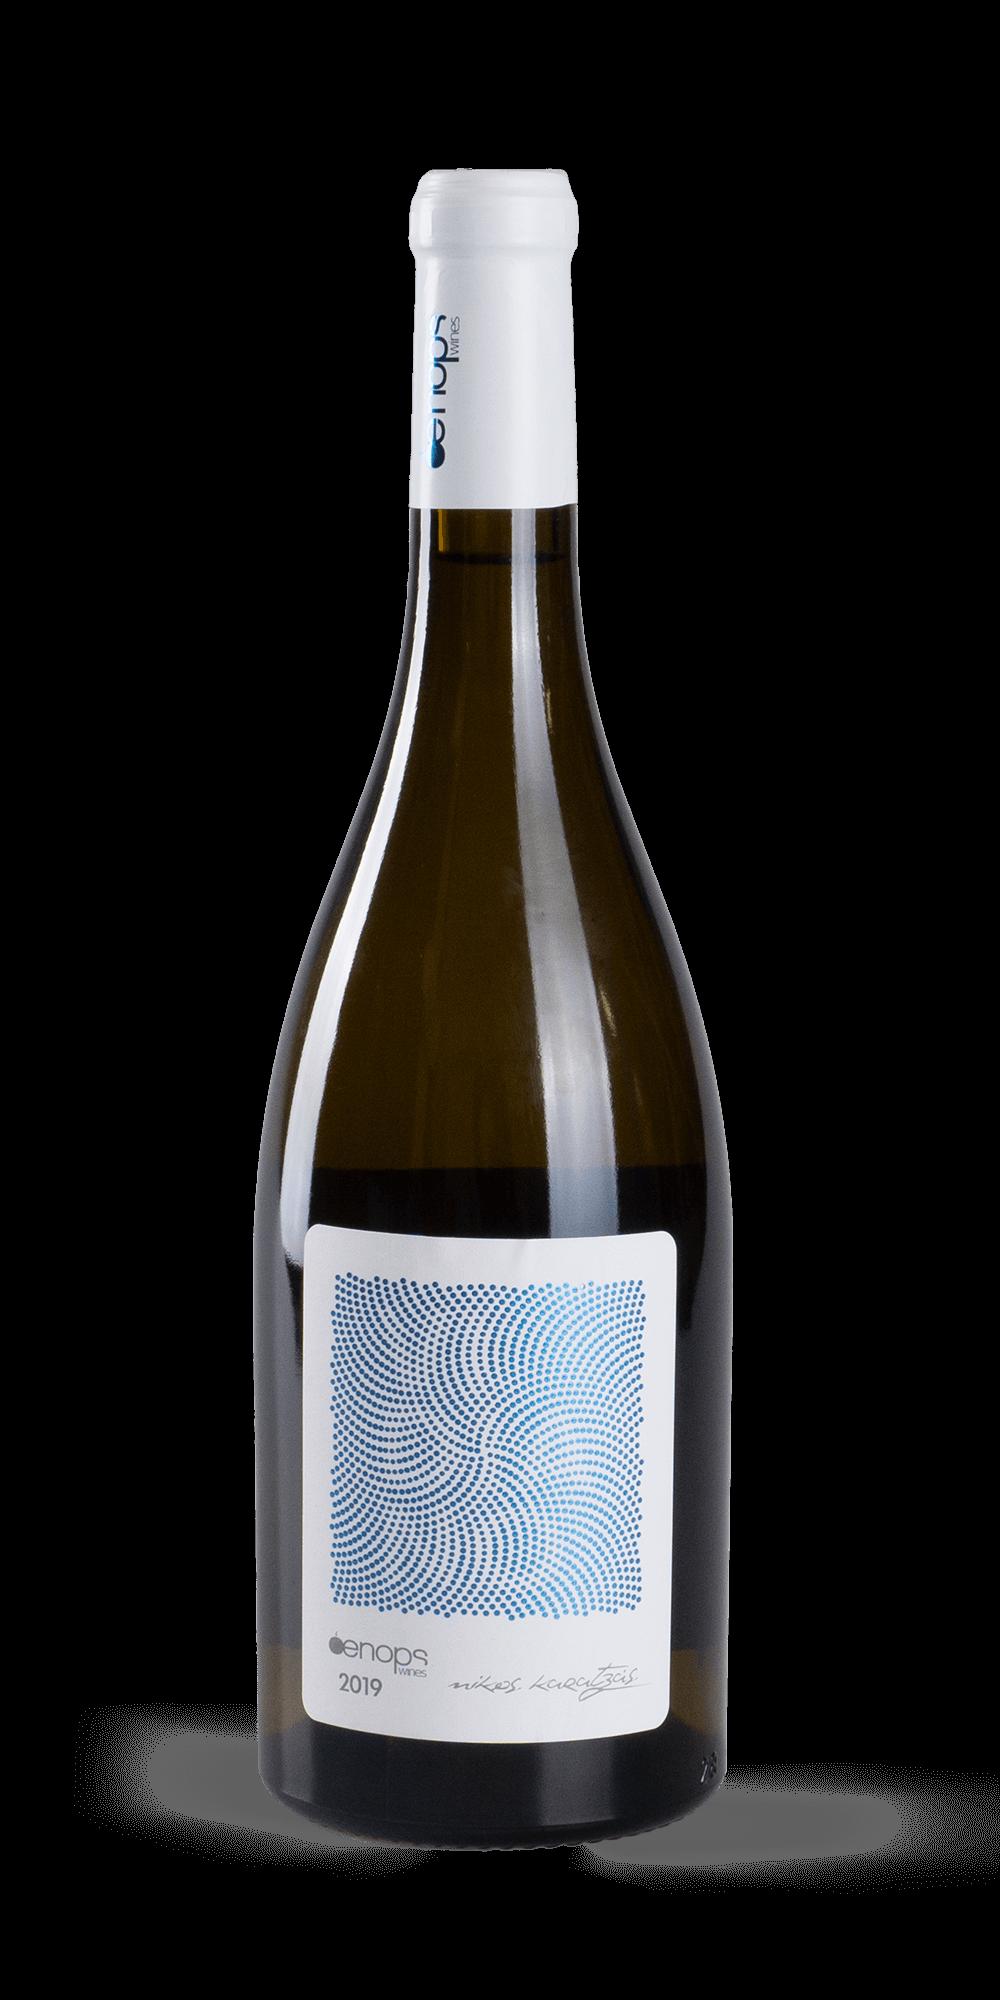 Vidiano 2019 (Oenops Wines)